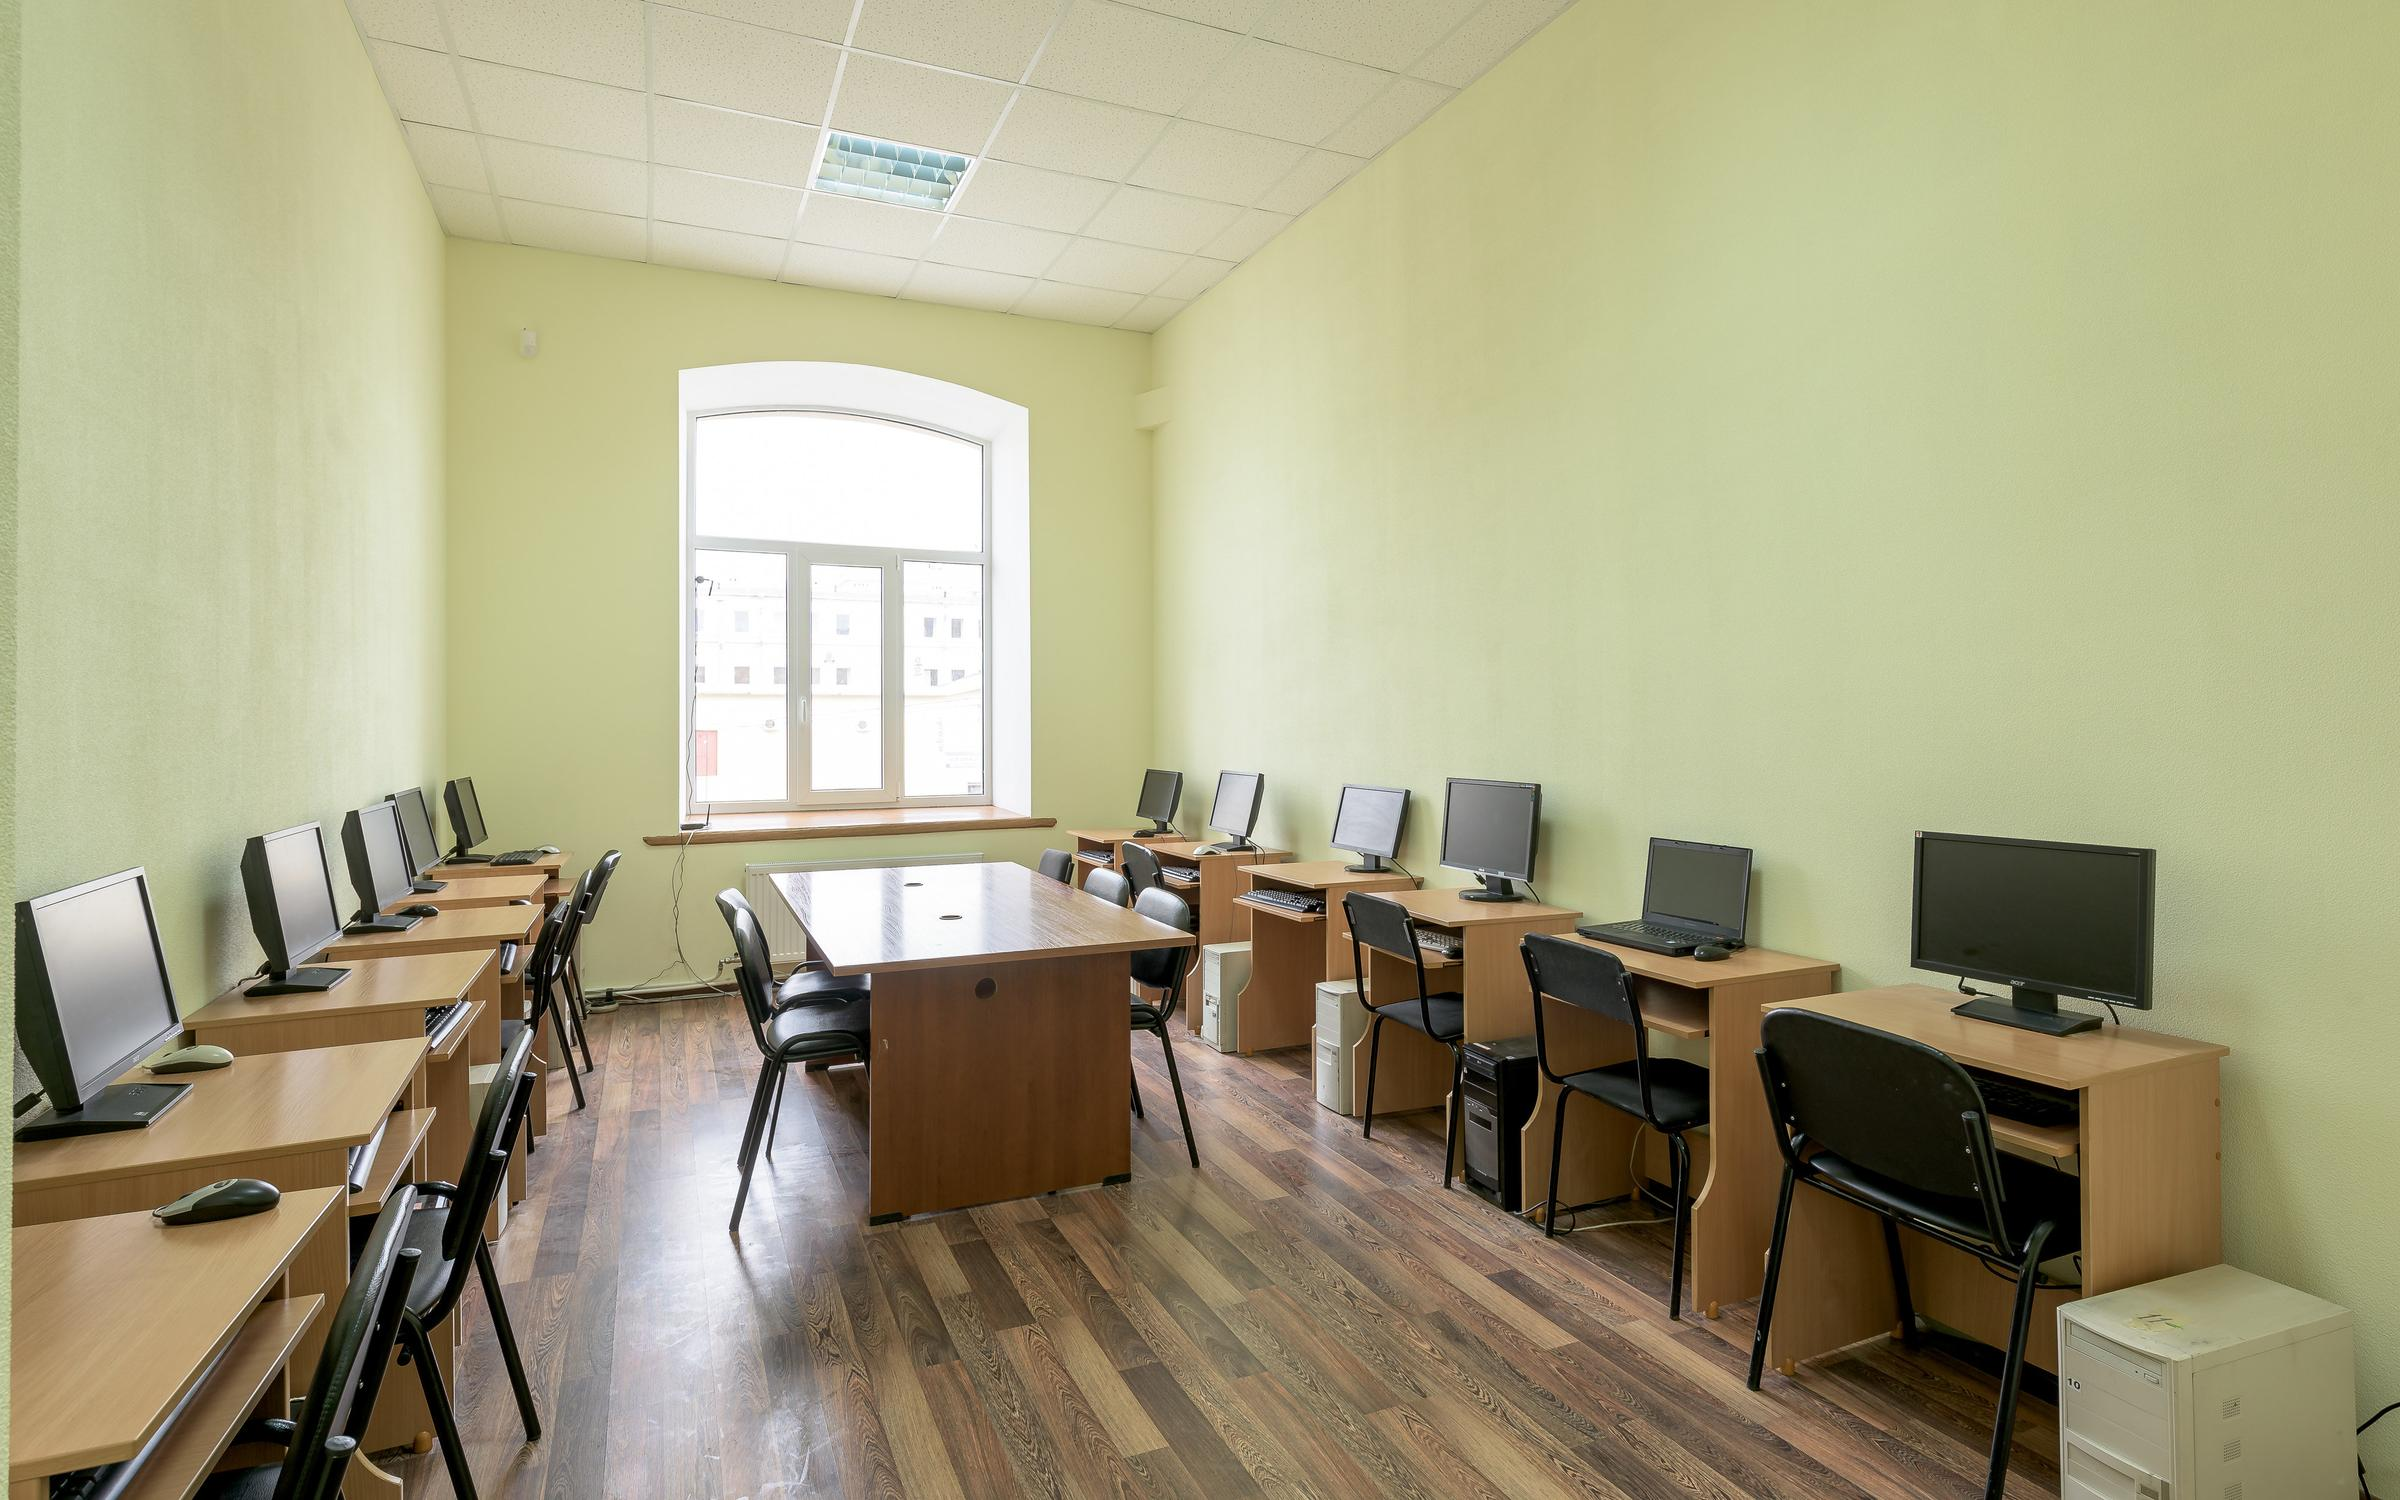 фотография Учебного центра Коннессанс на метро Московские Ворота